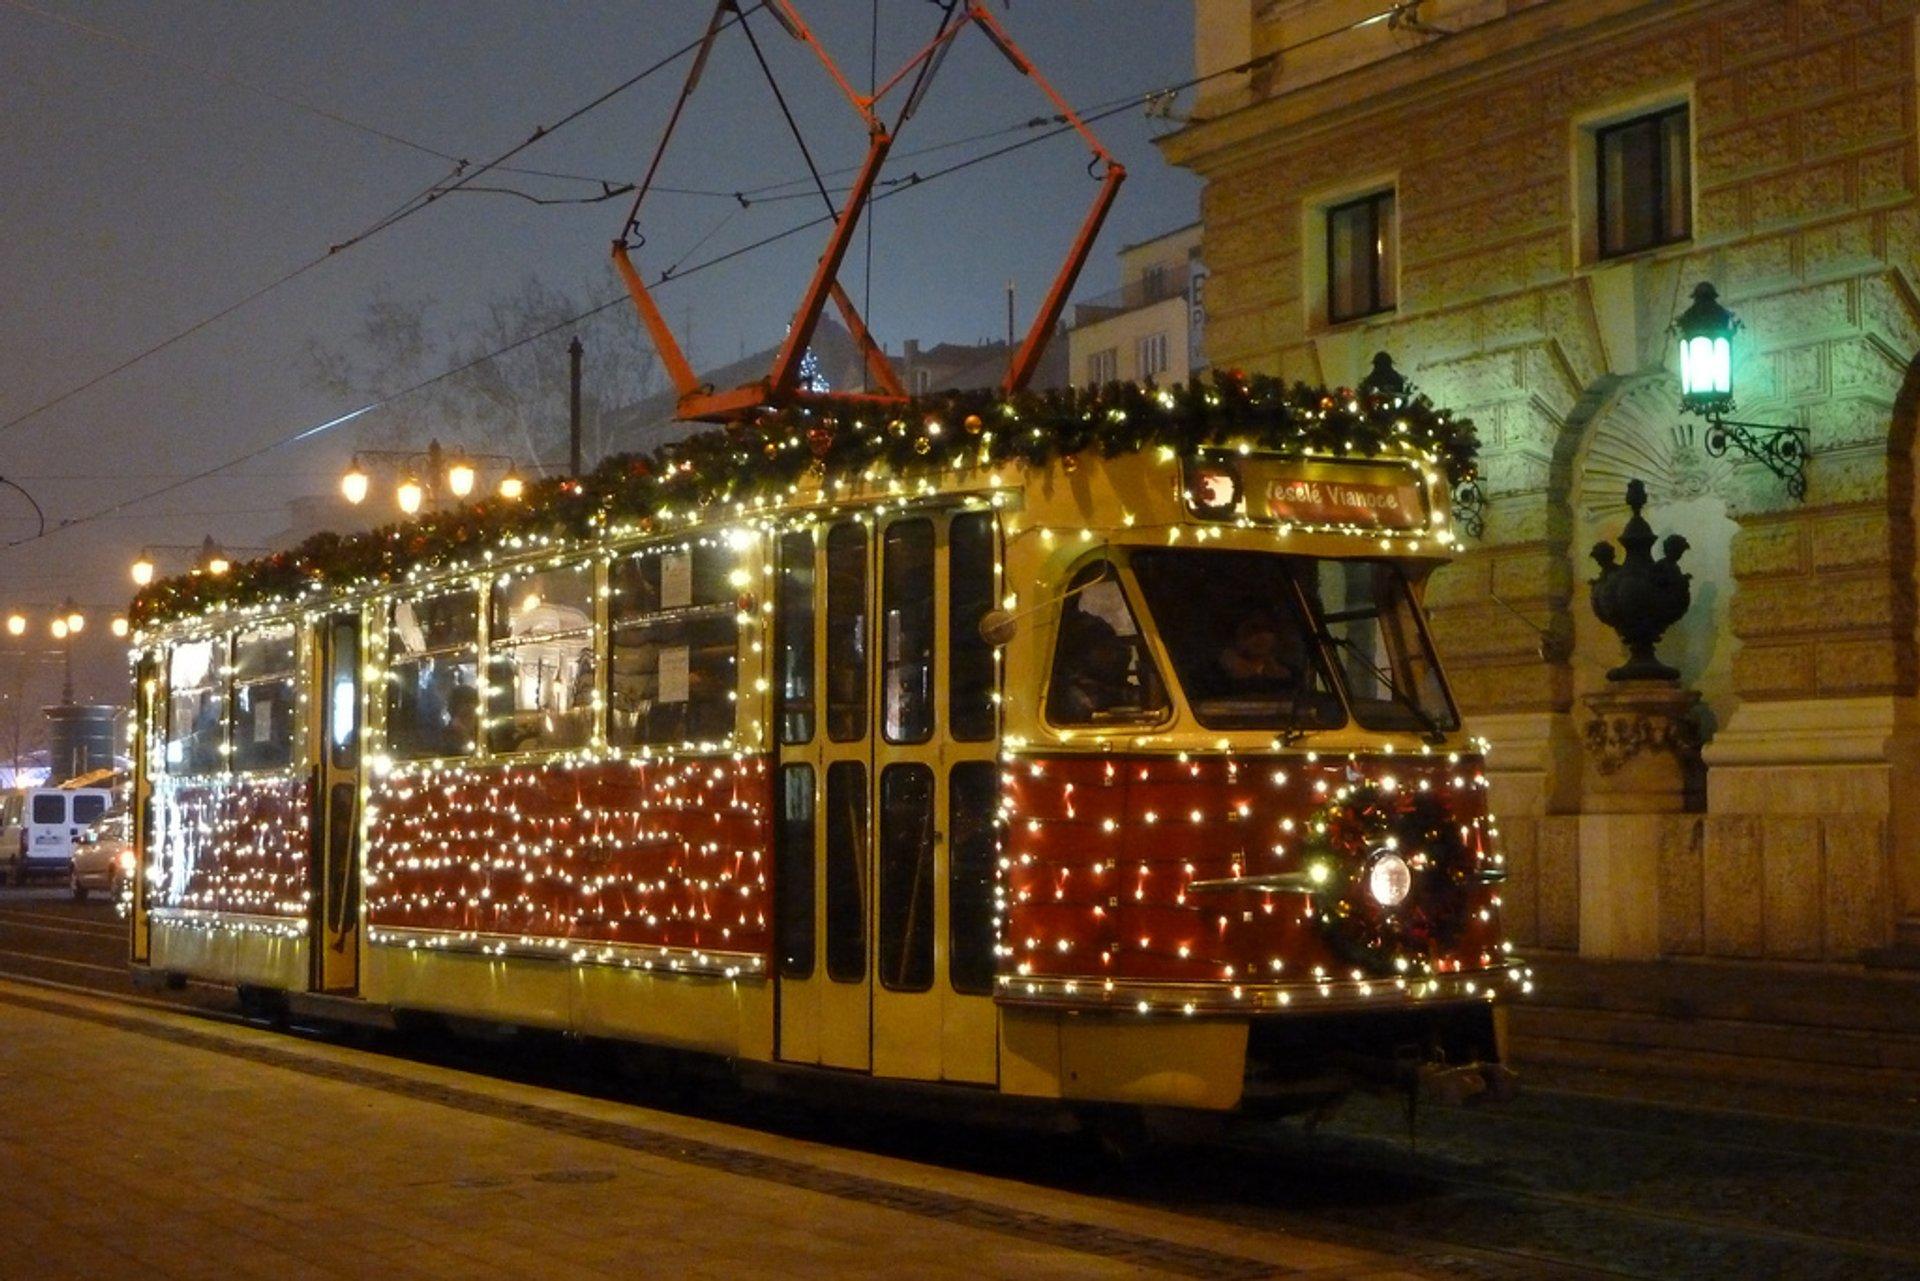 Christmas Tram in Bratislava in Slovakia 2019 - Best Time